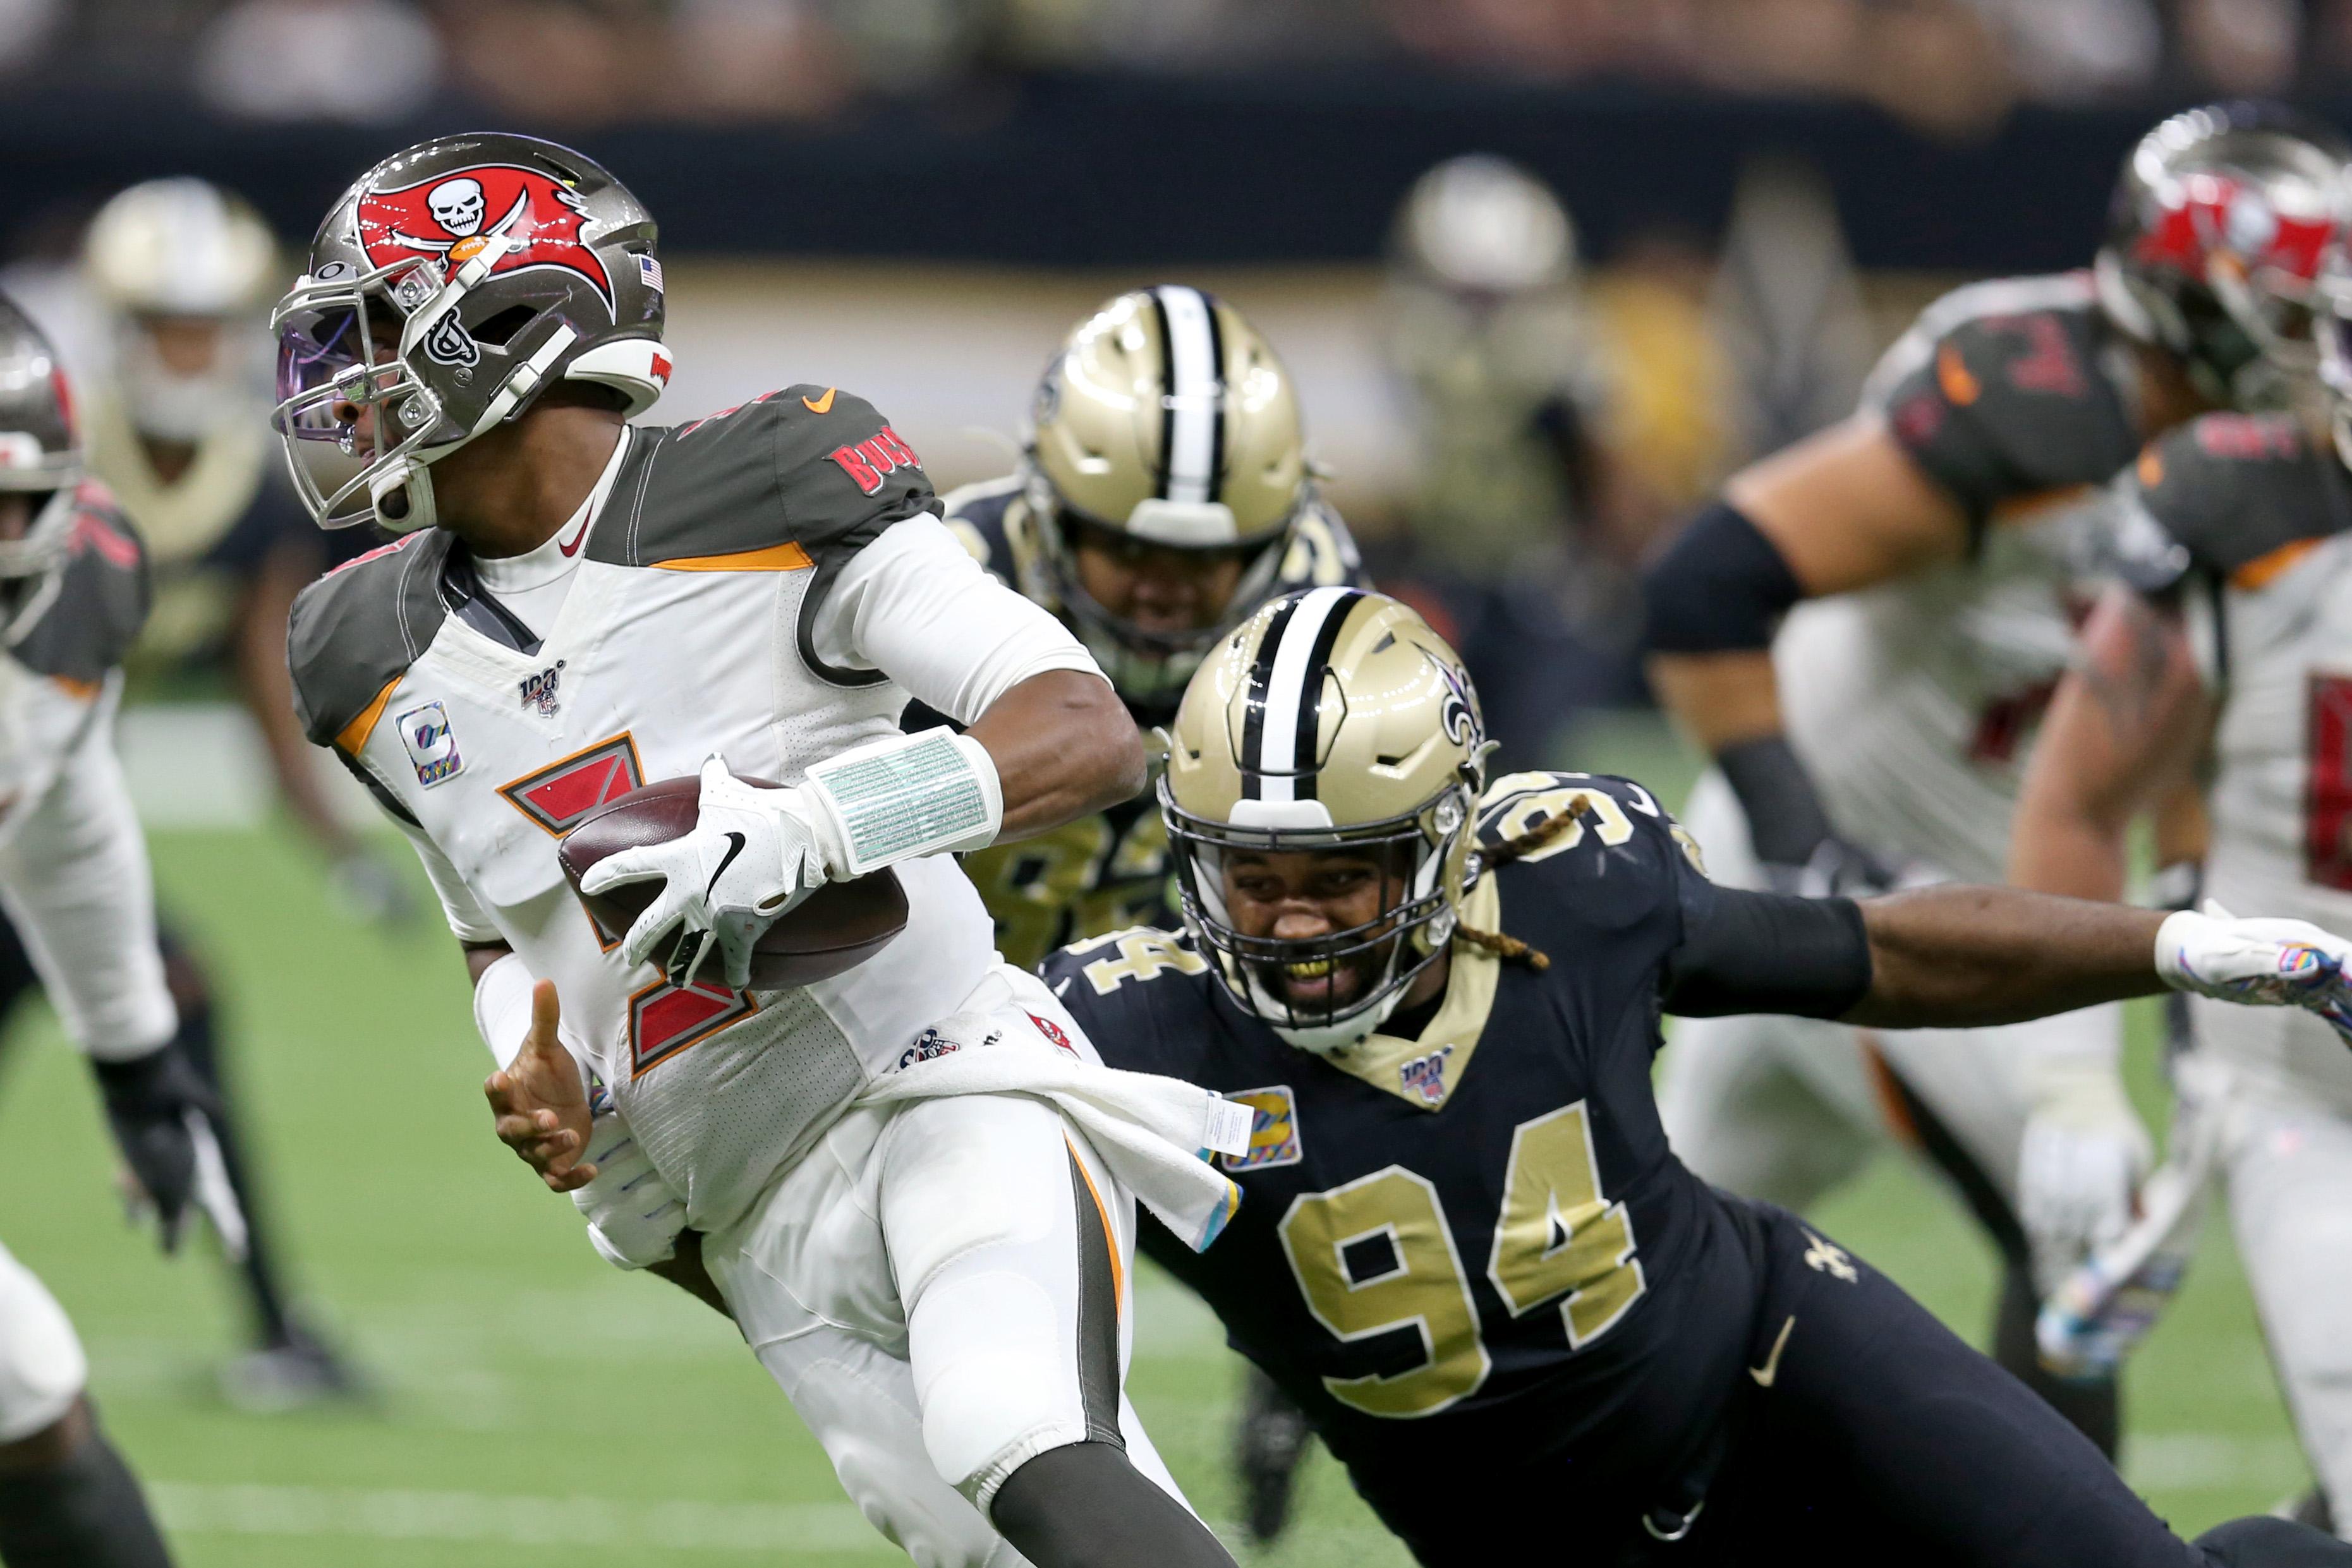 NFL: Tampa Bay Buccaneers at New Orleans Saints